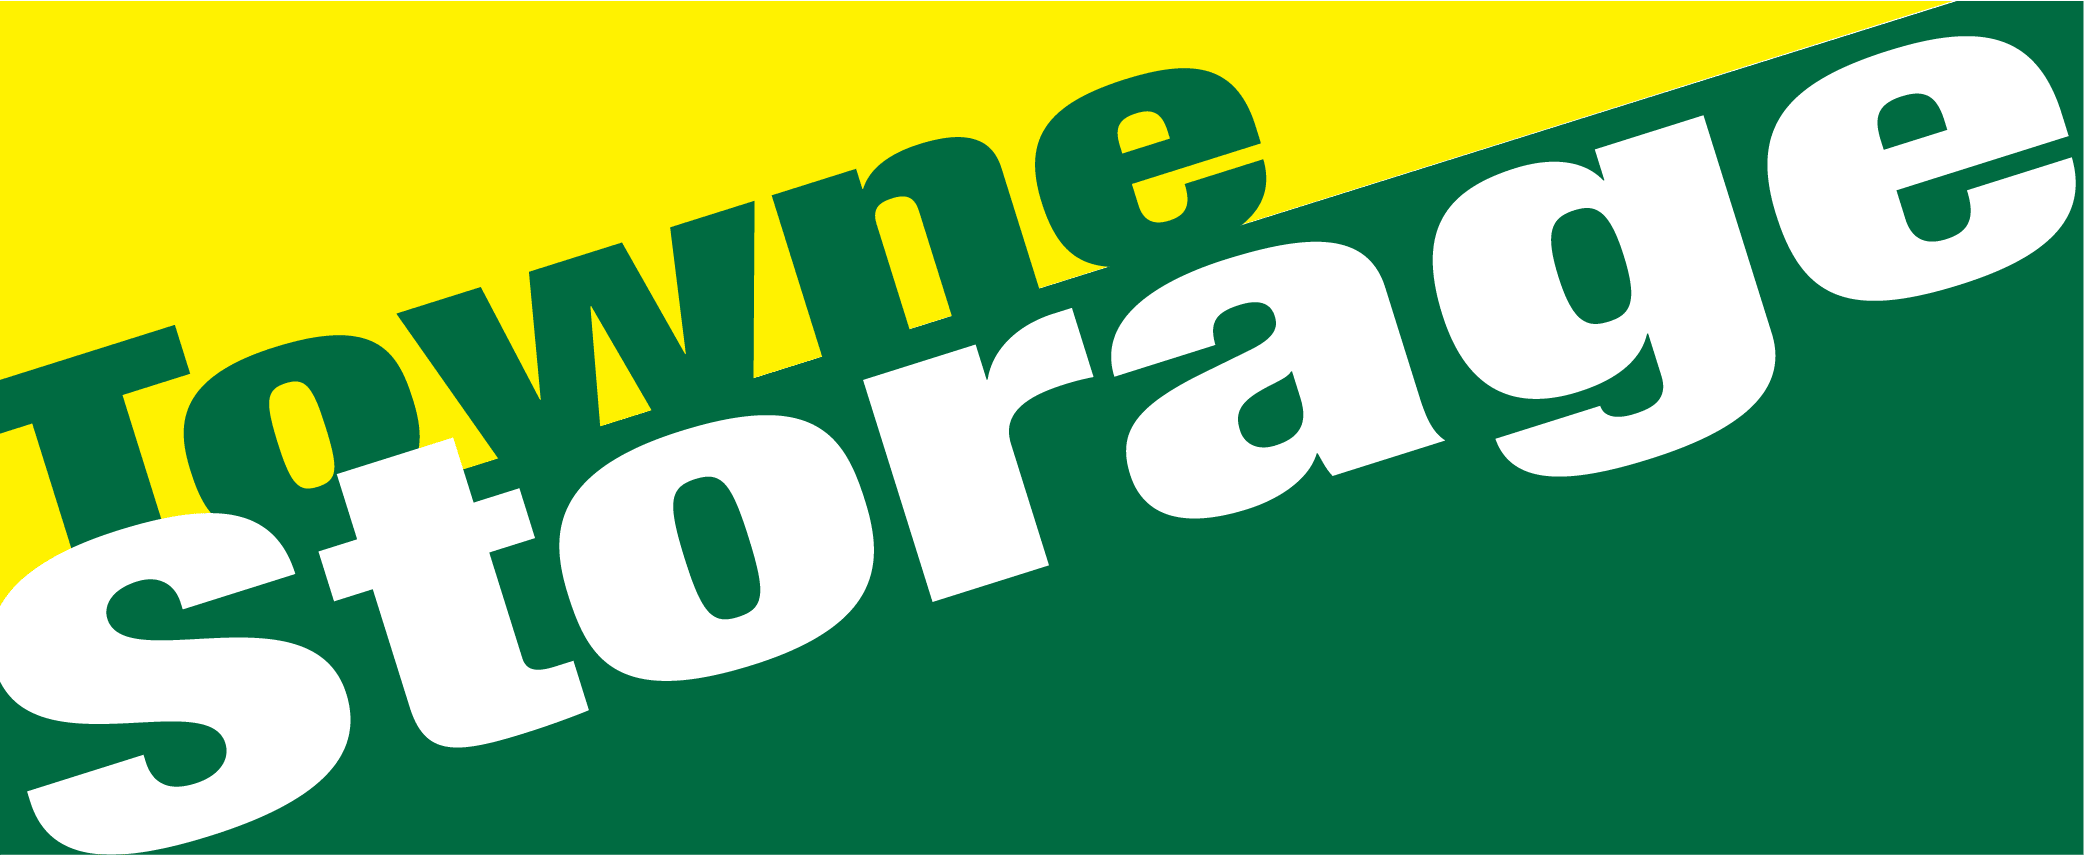 Towne Storage - Mesa logo